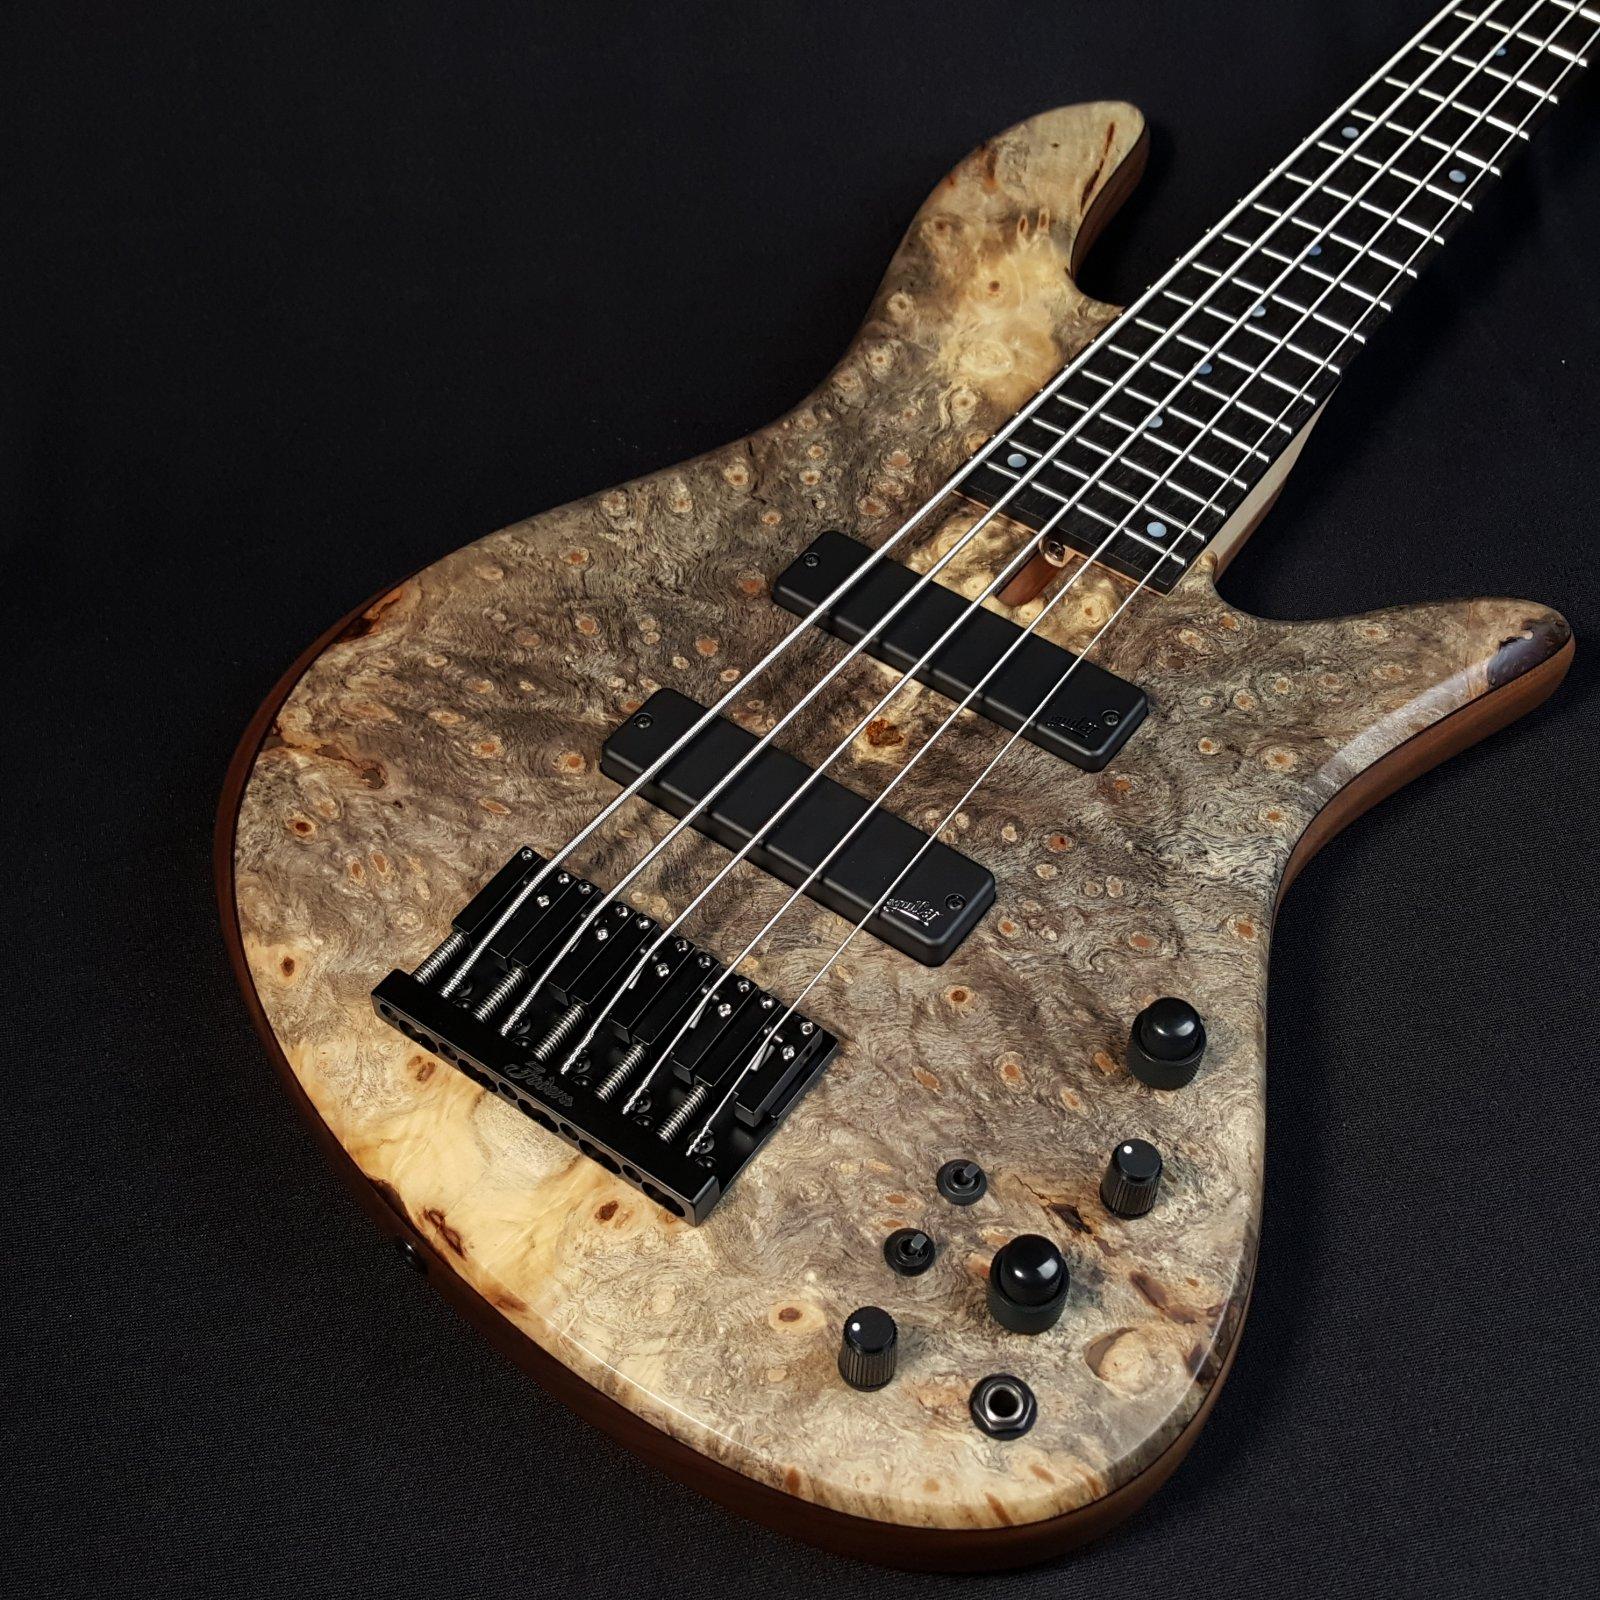 Fodera Emperor 5 Standard Special Buckeye Burl 5 String Bass With Case